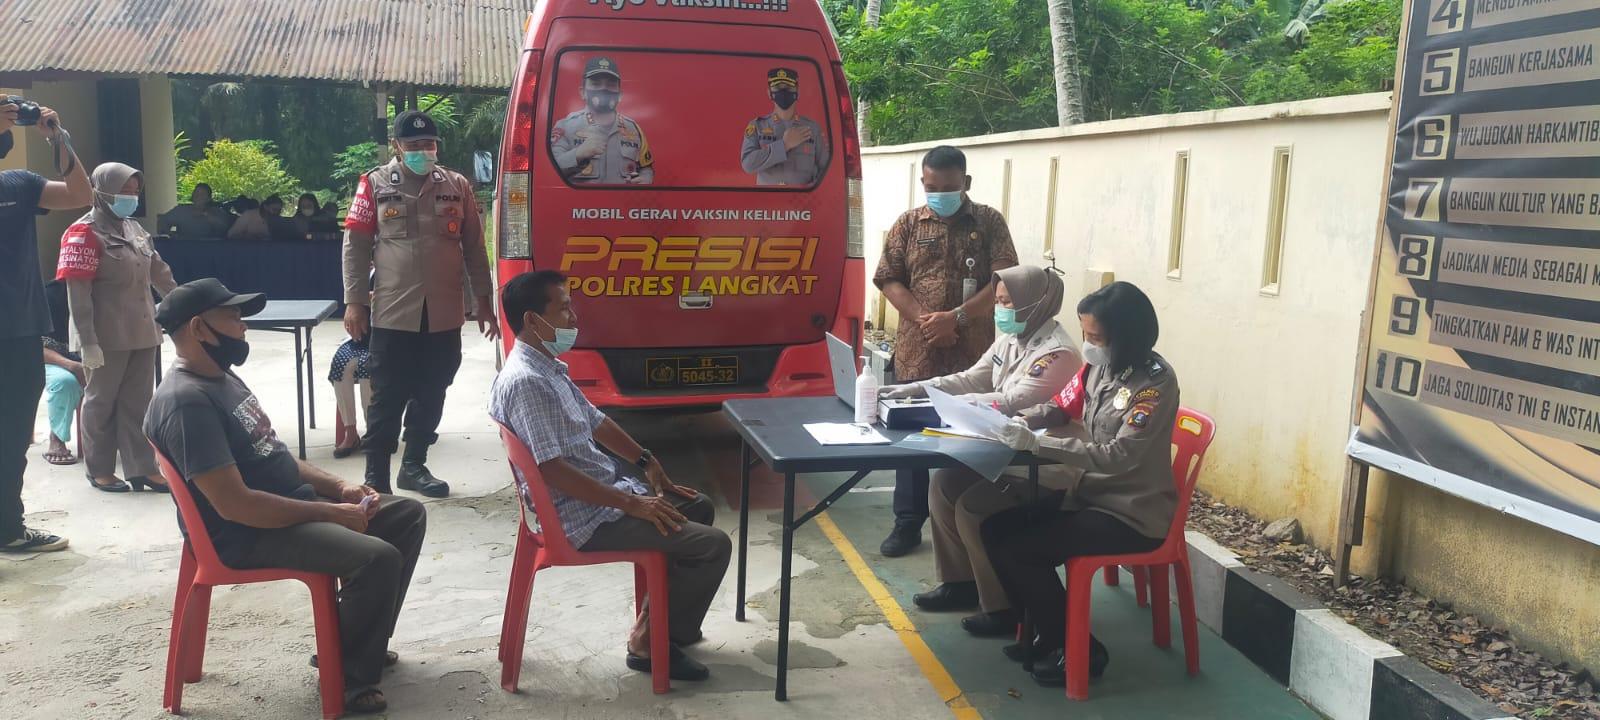 KPCPEN: 805.350 target vaksinasi di Kabupaten Langkat